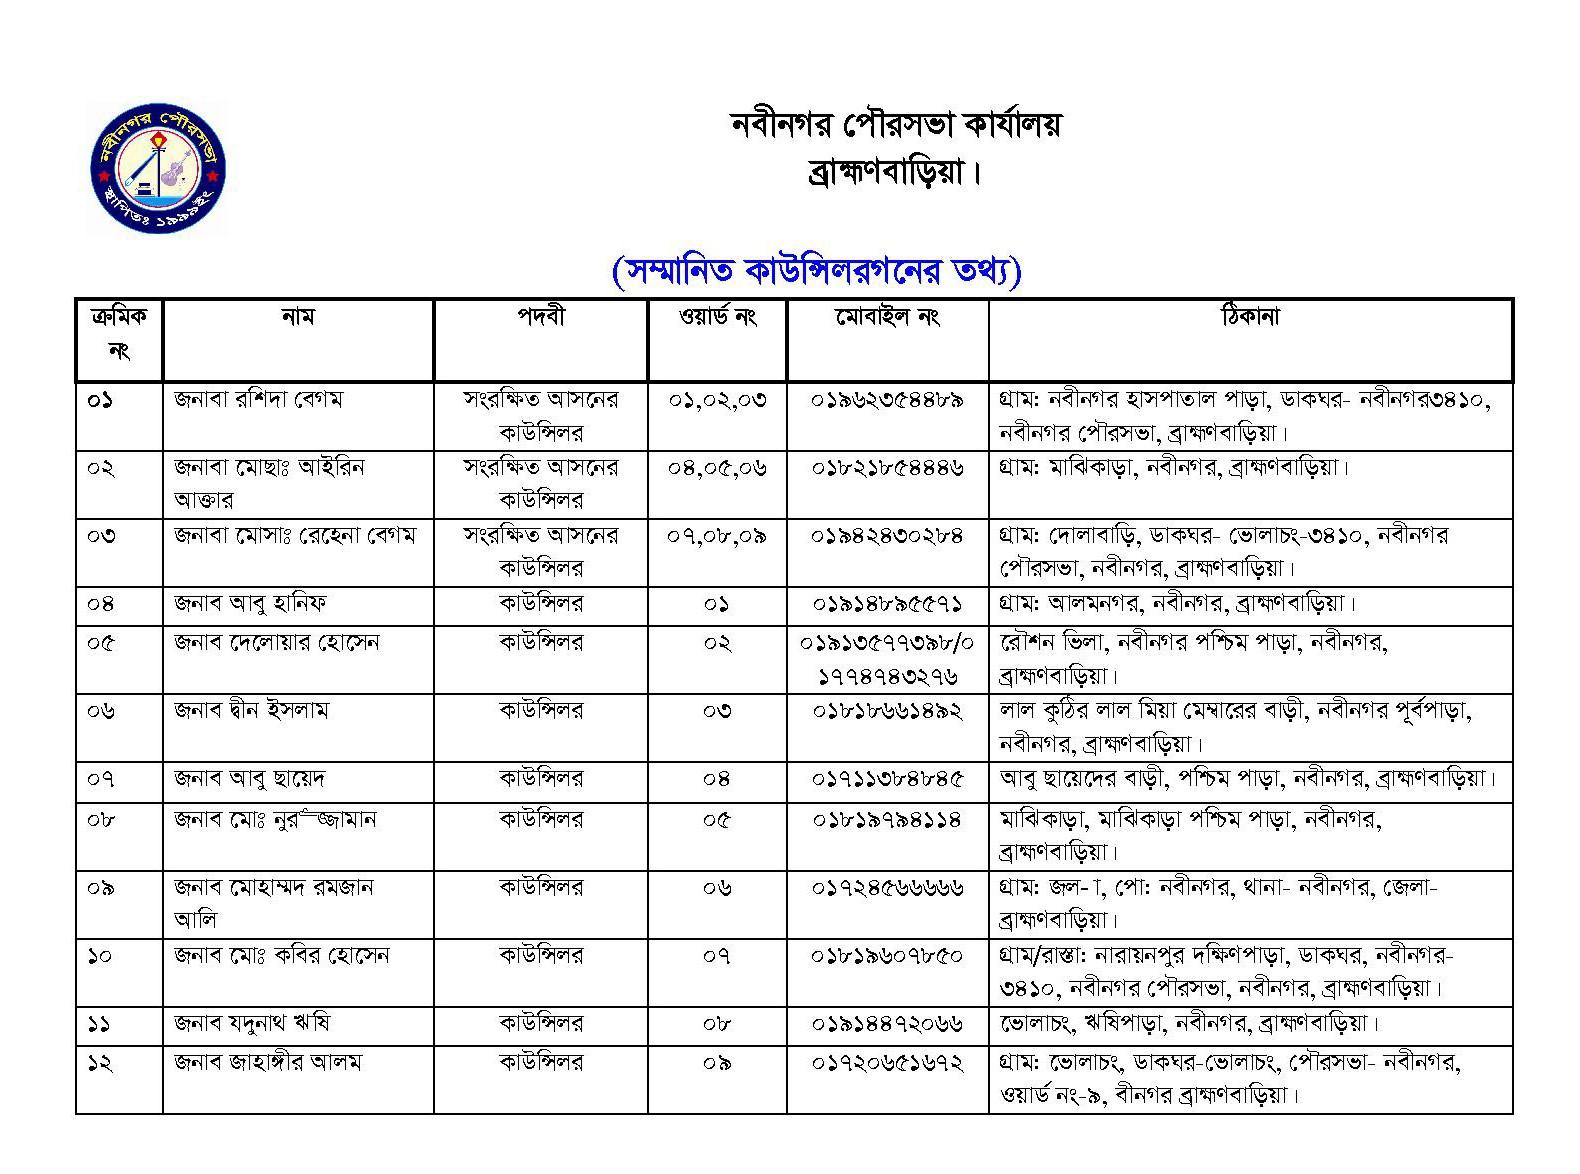 Date of Comisionar